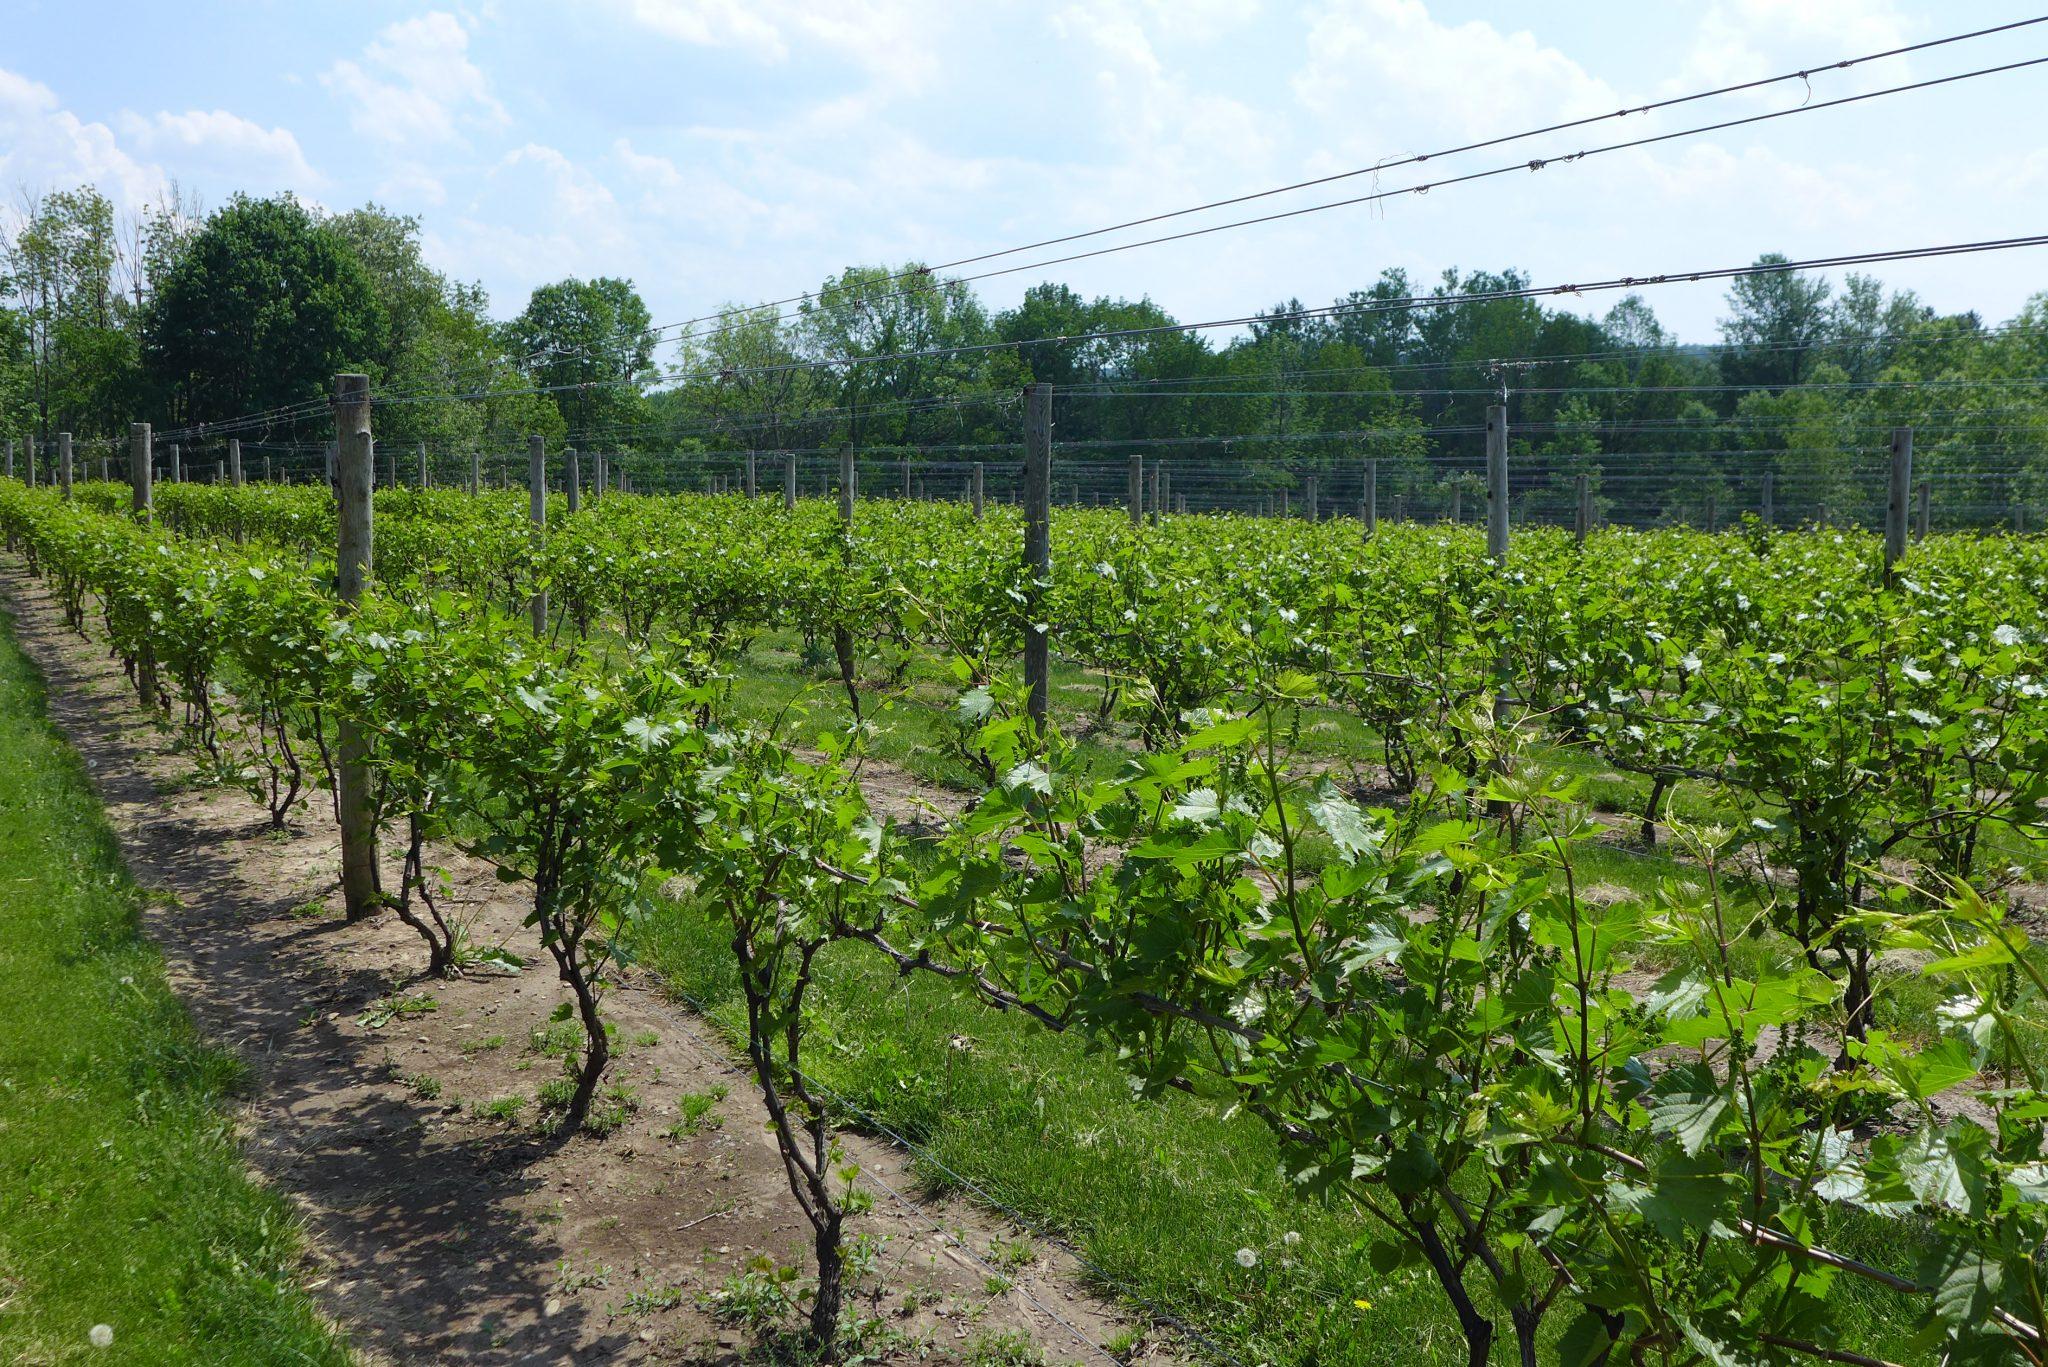 Owera Vineyards grapes on the vine